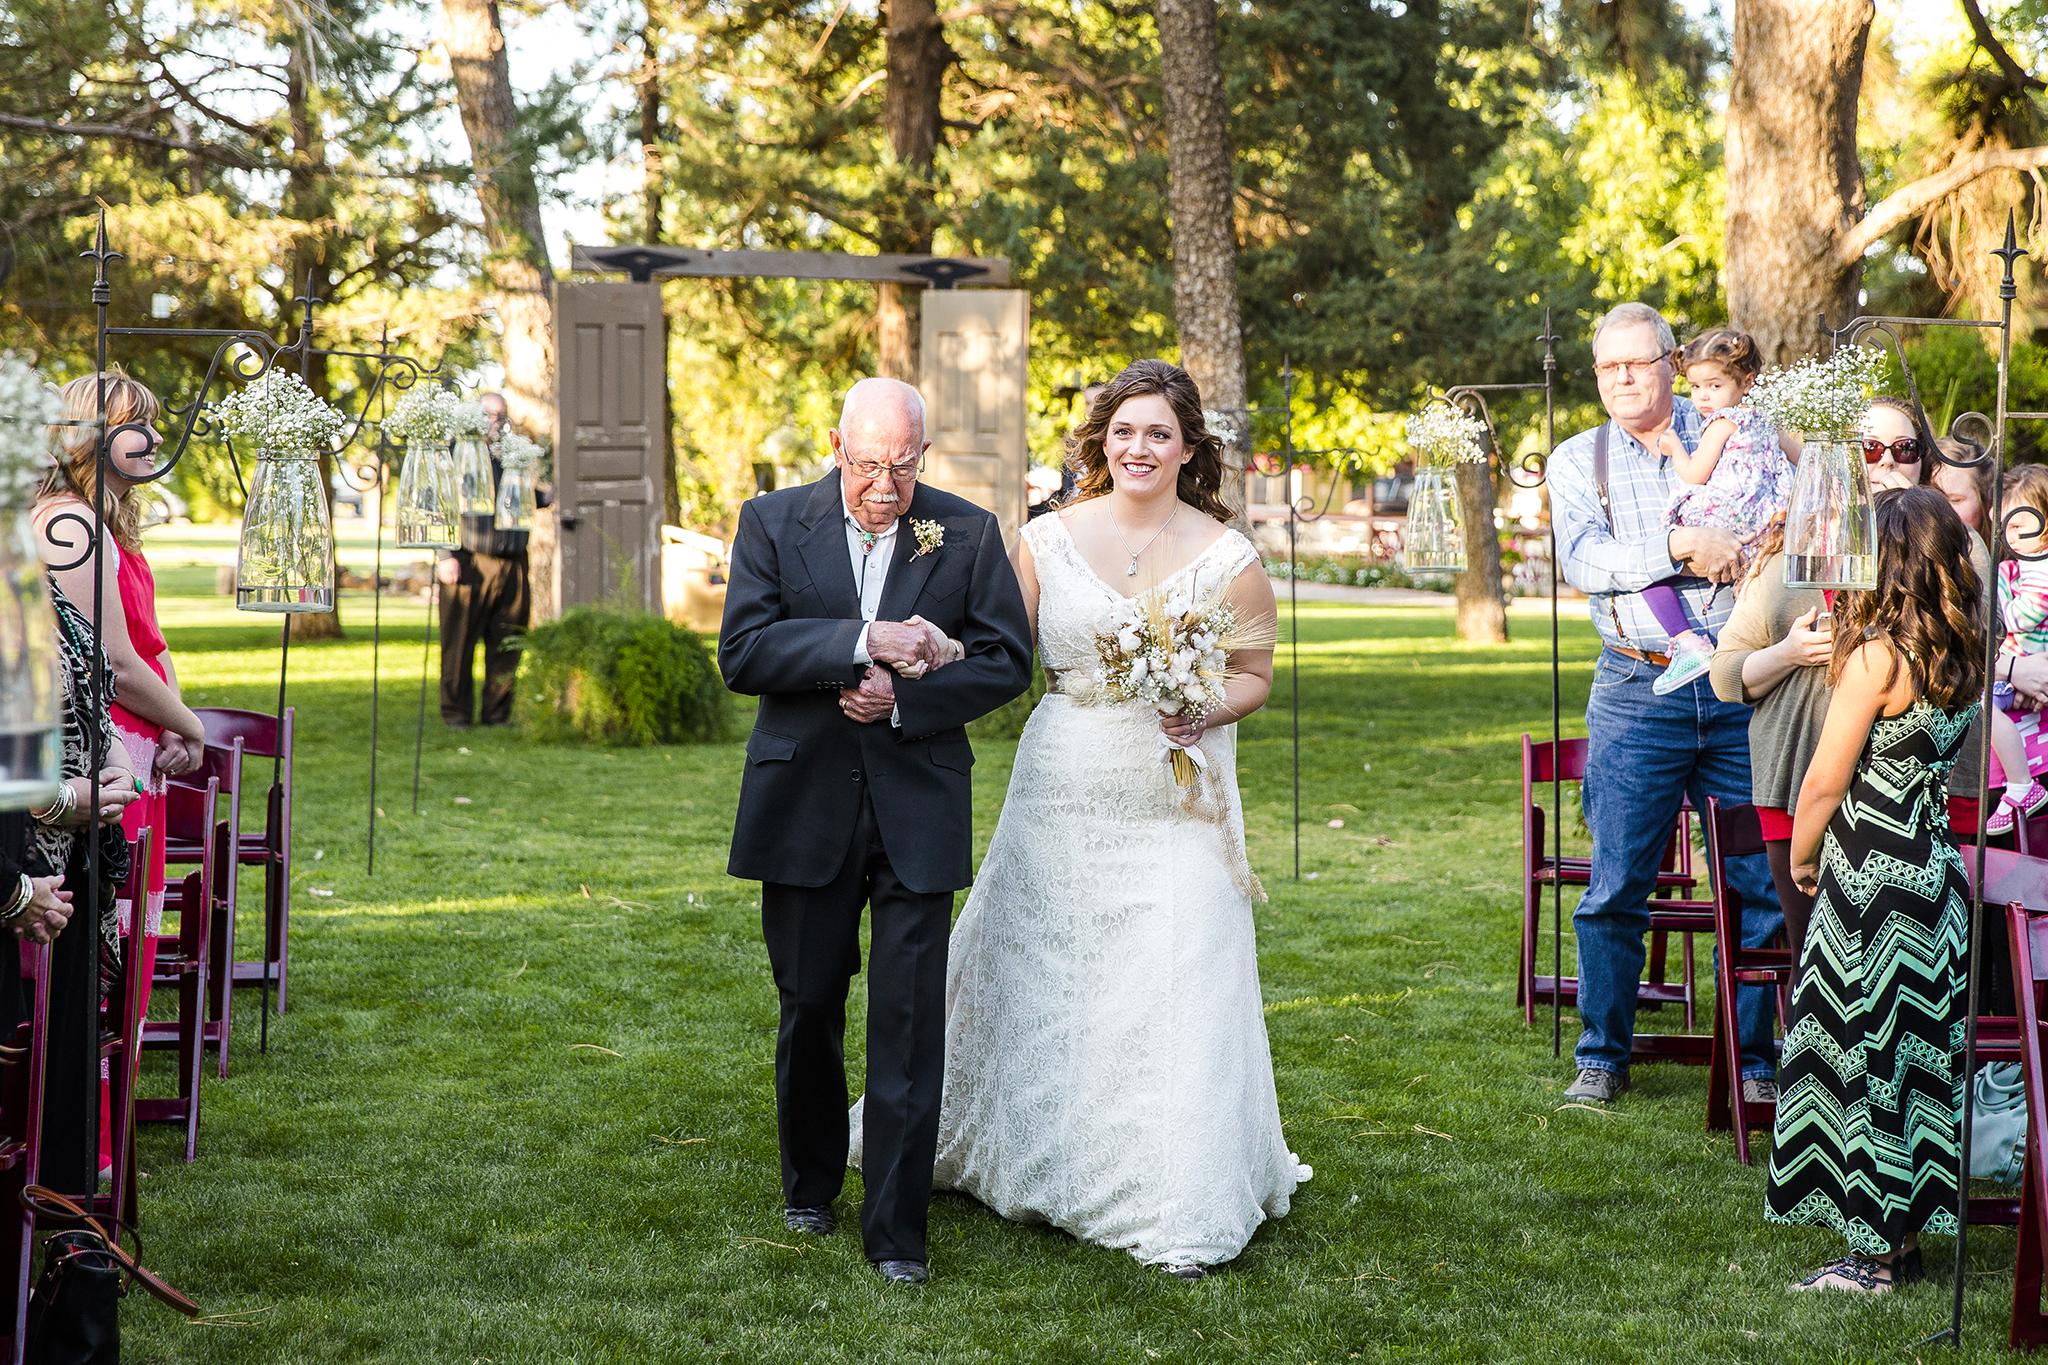 Lubbock Wedding Photography Wedding Photographer Walnut Tree Walking Down the Aisle